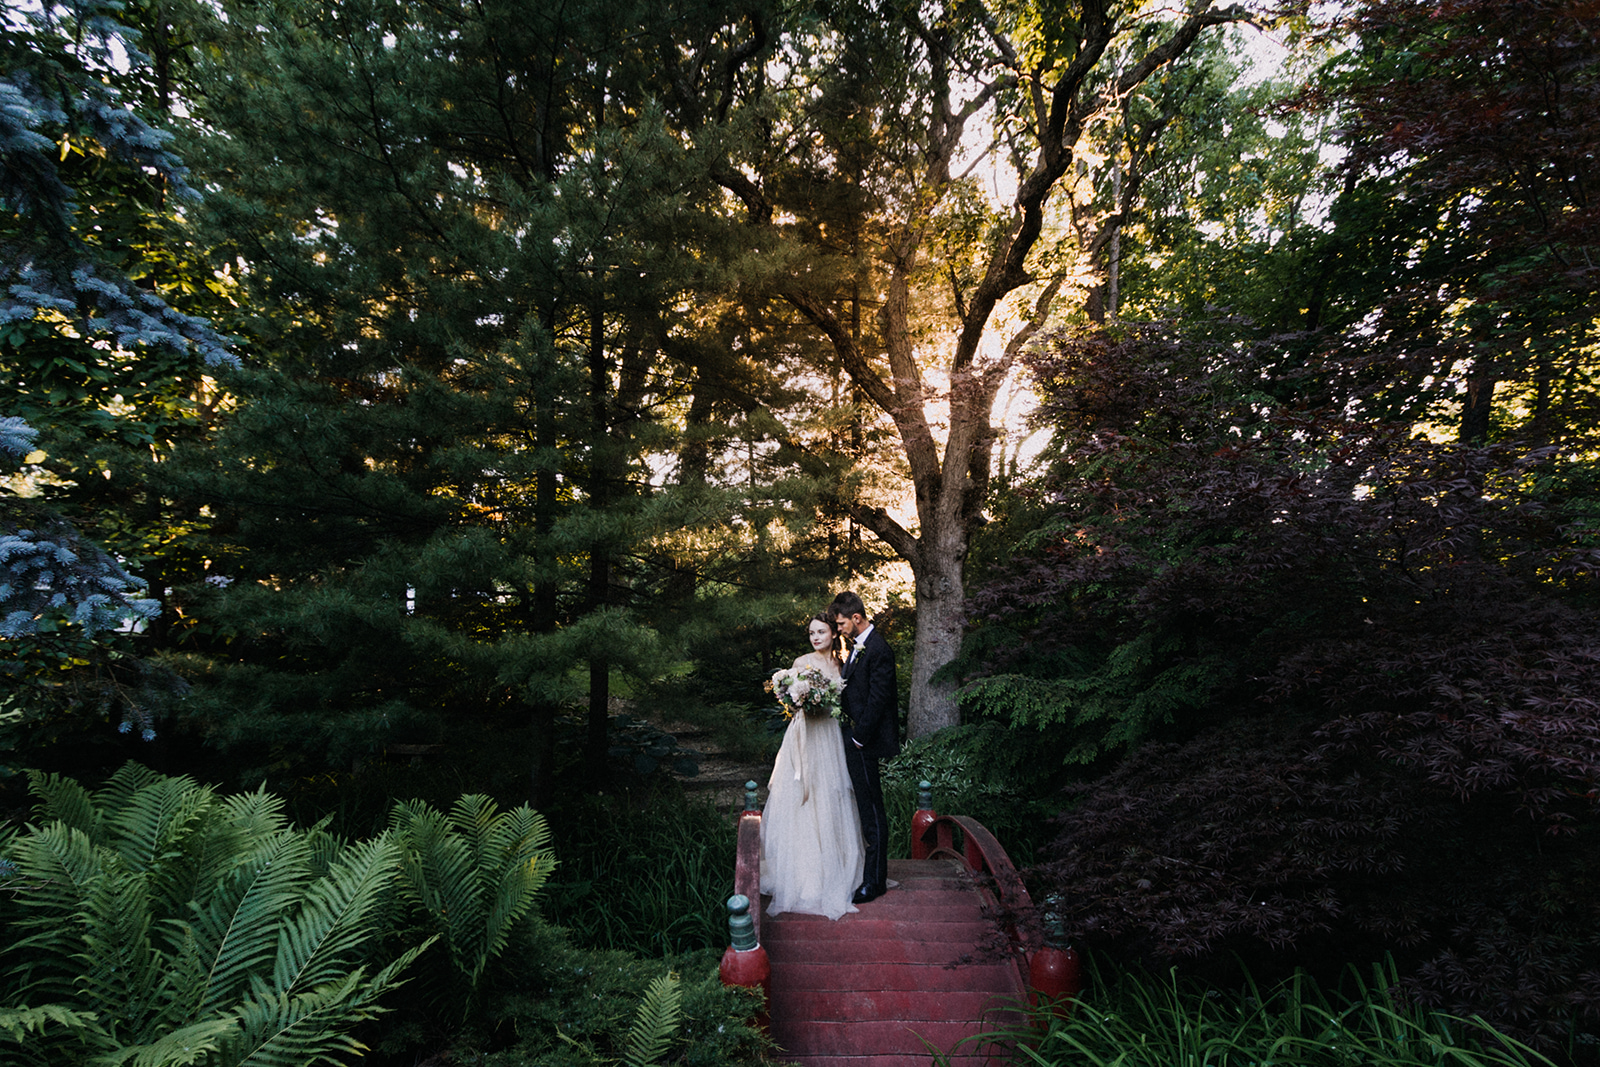 Romantic Bride and Groom Portrait Chicago Wedding lisa kathan photography